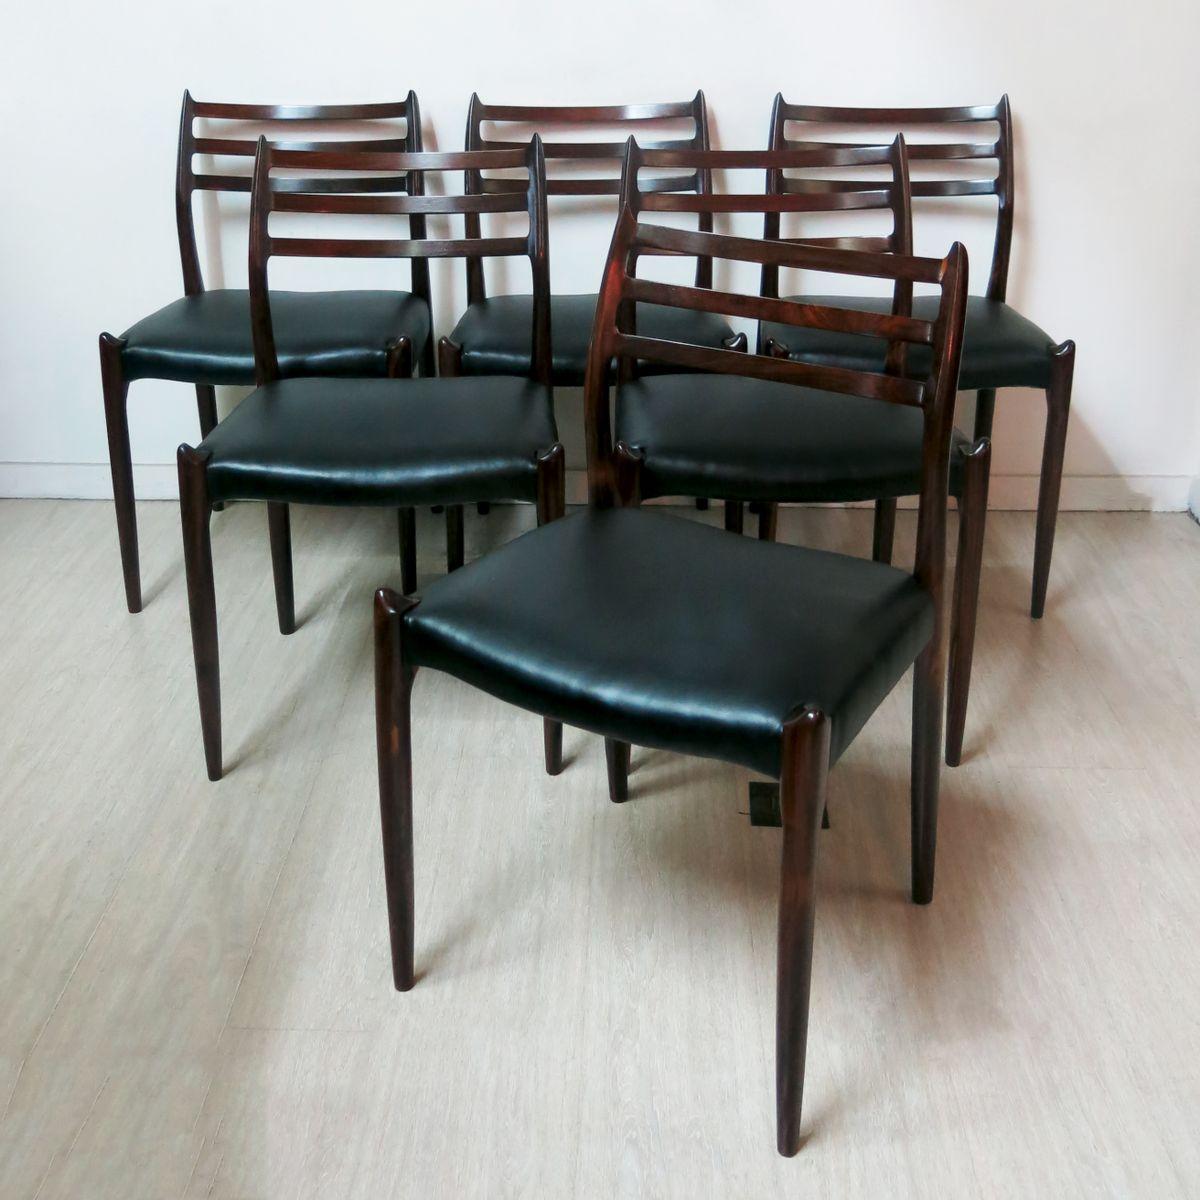 esszimmerst hle von niels o m ller 1960 6er set bei pamono kaufen. Black Bedroom Furniture Sets. Home Design Ideas